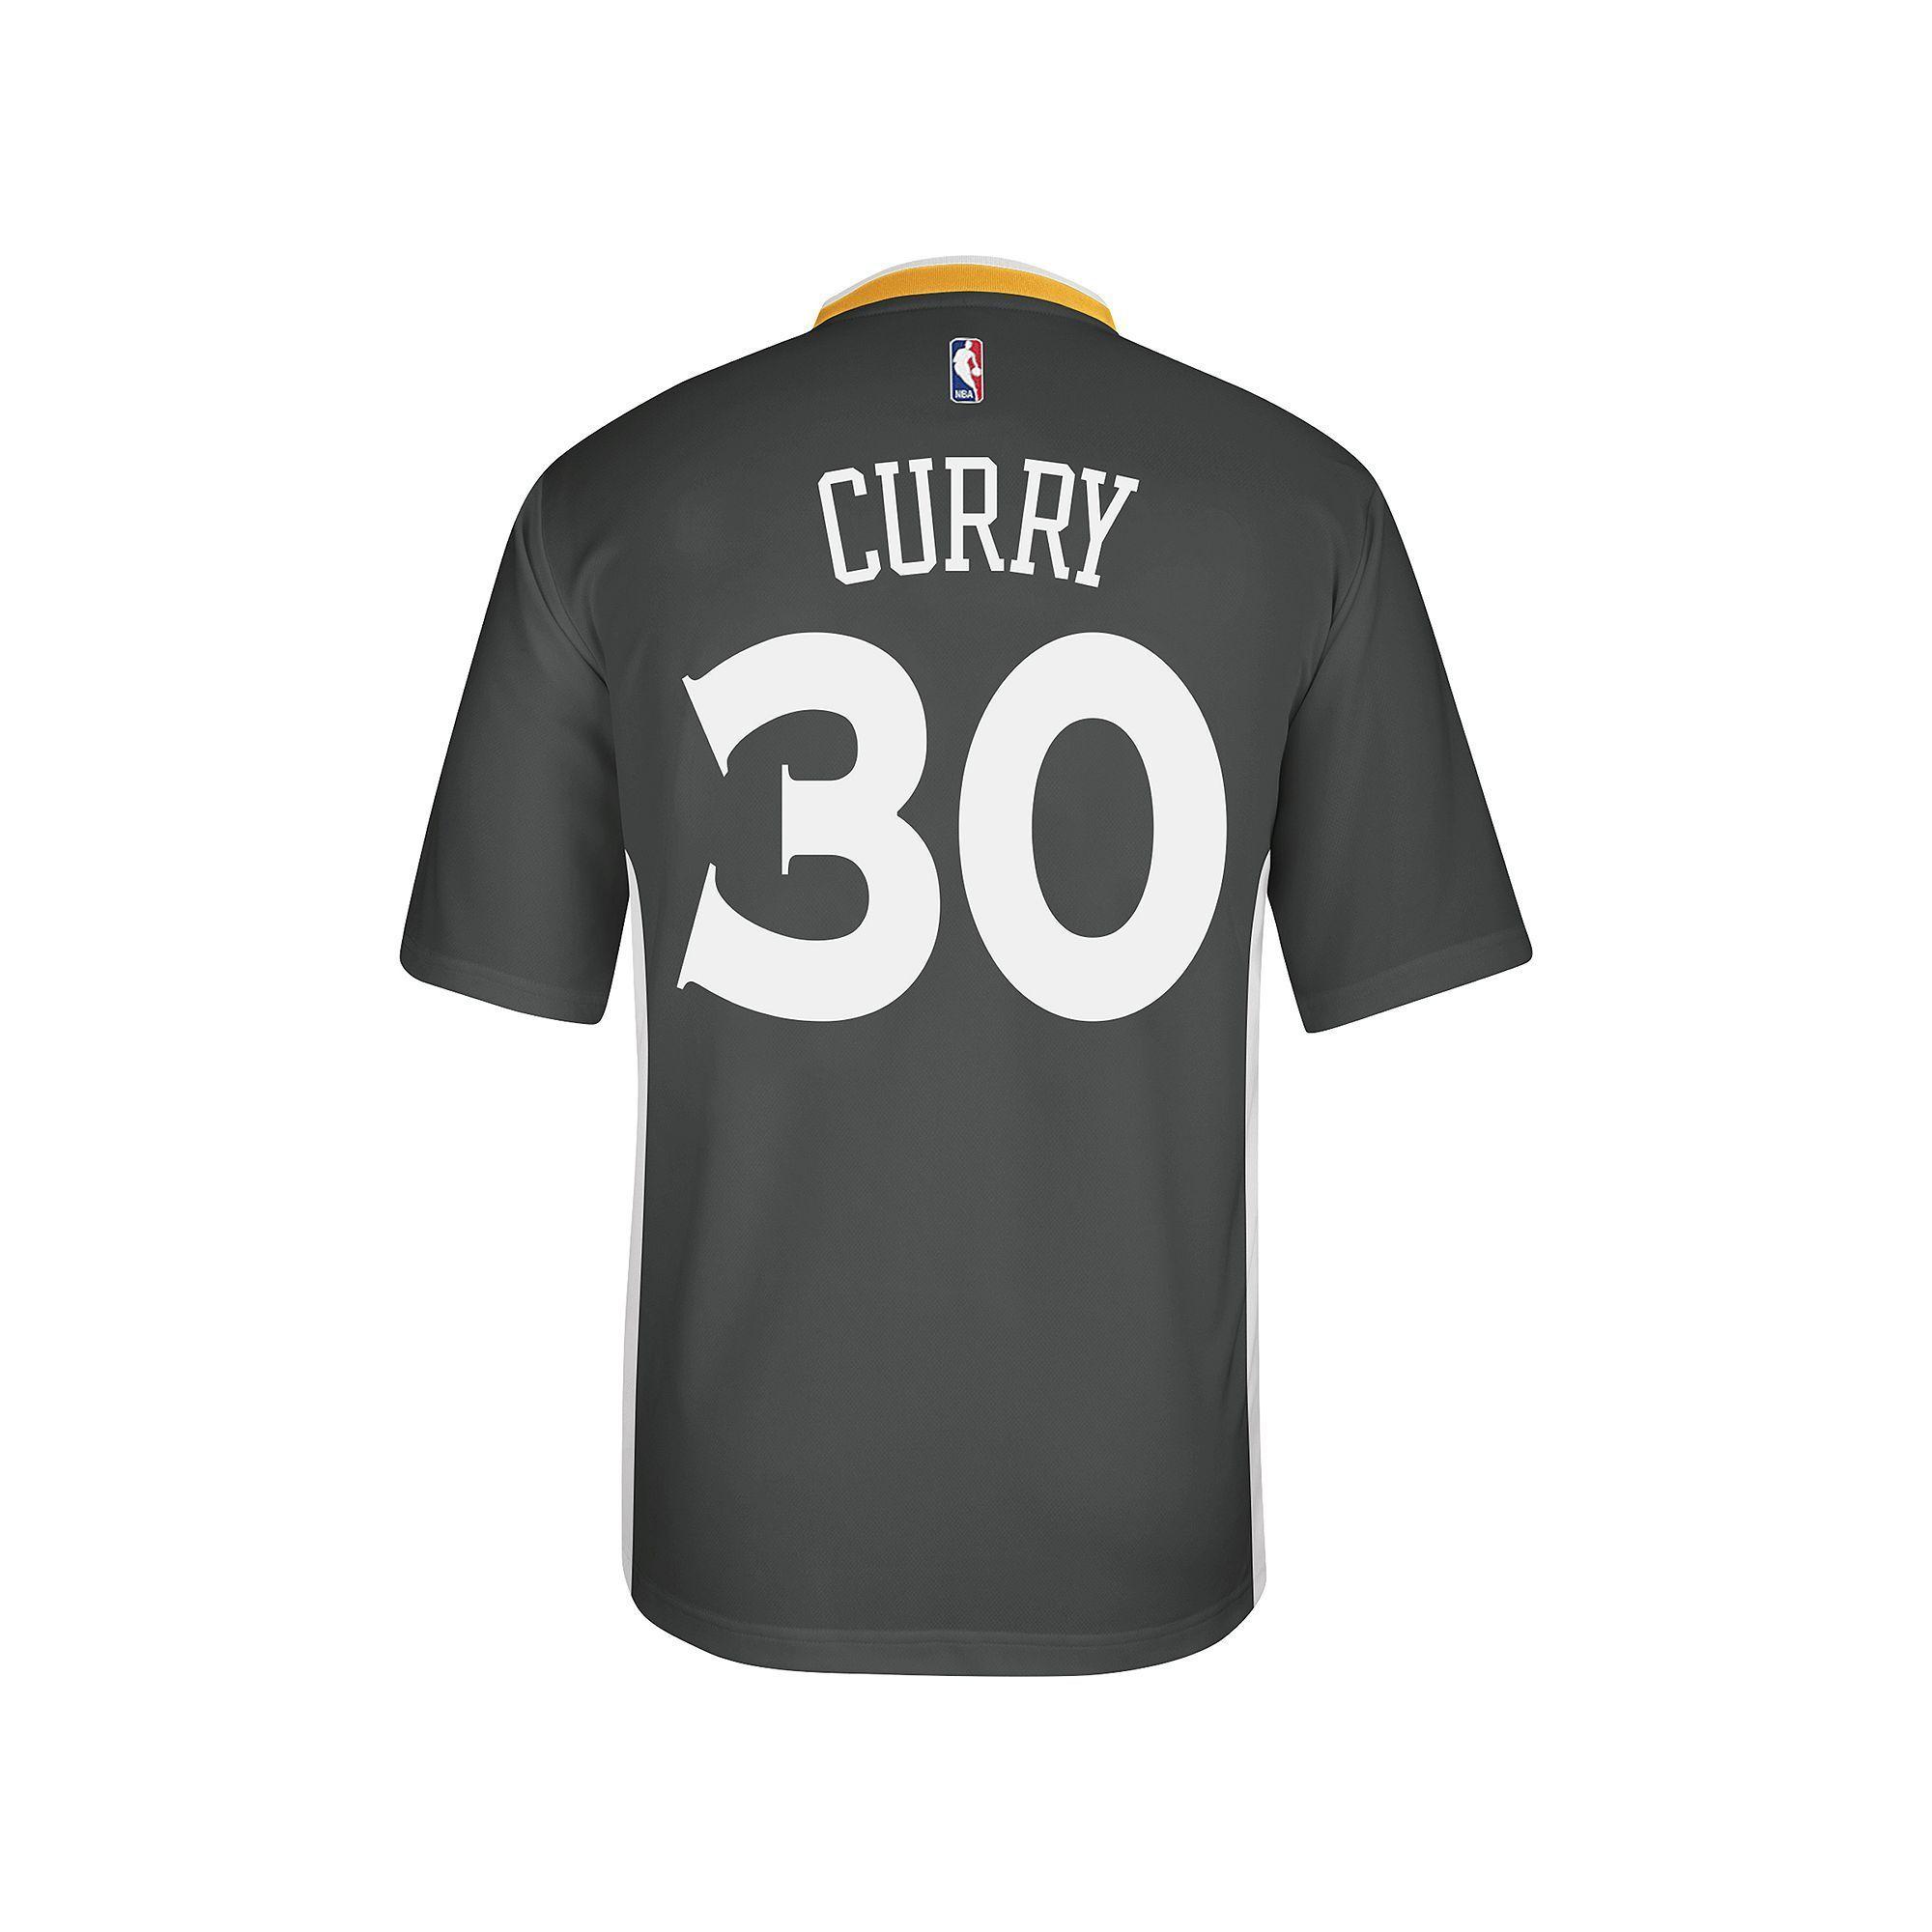 Adidas Men's Golden State Warriors Stephen Curry Replica Jersey, Size: Medium, Black